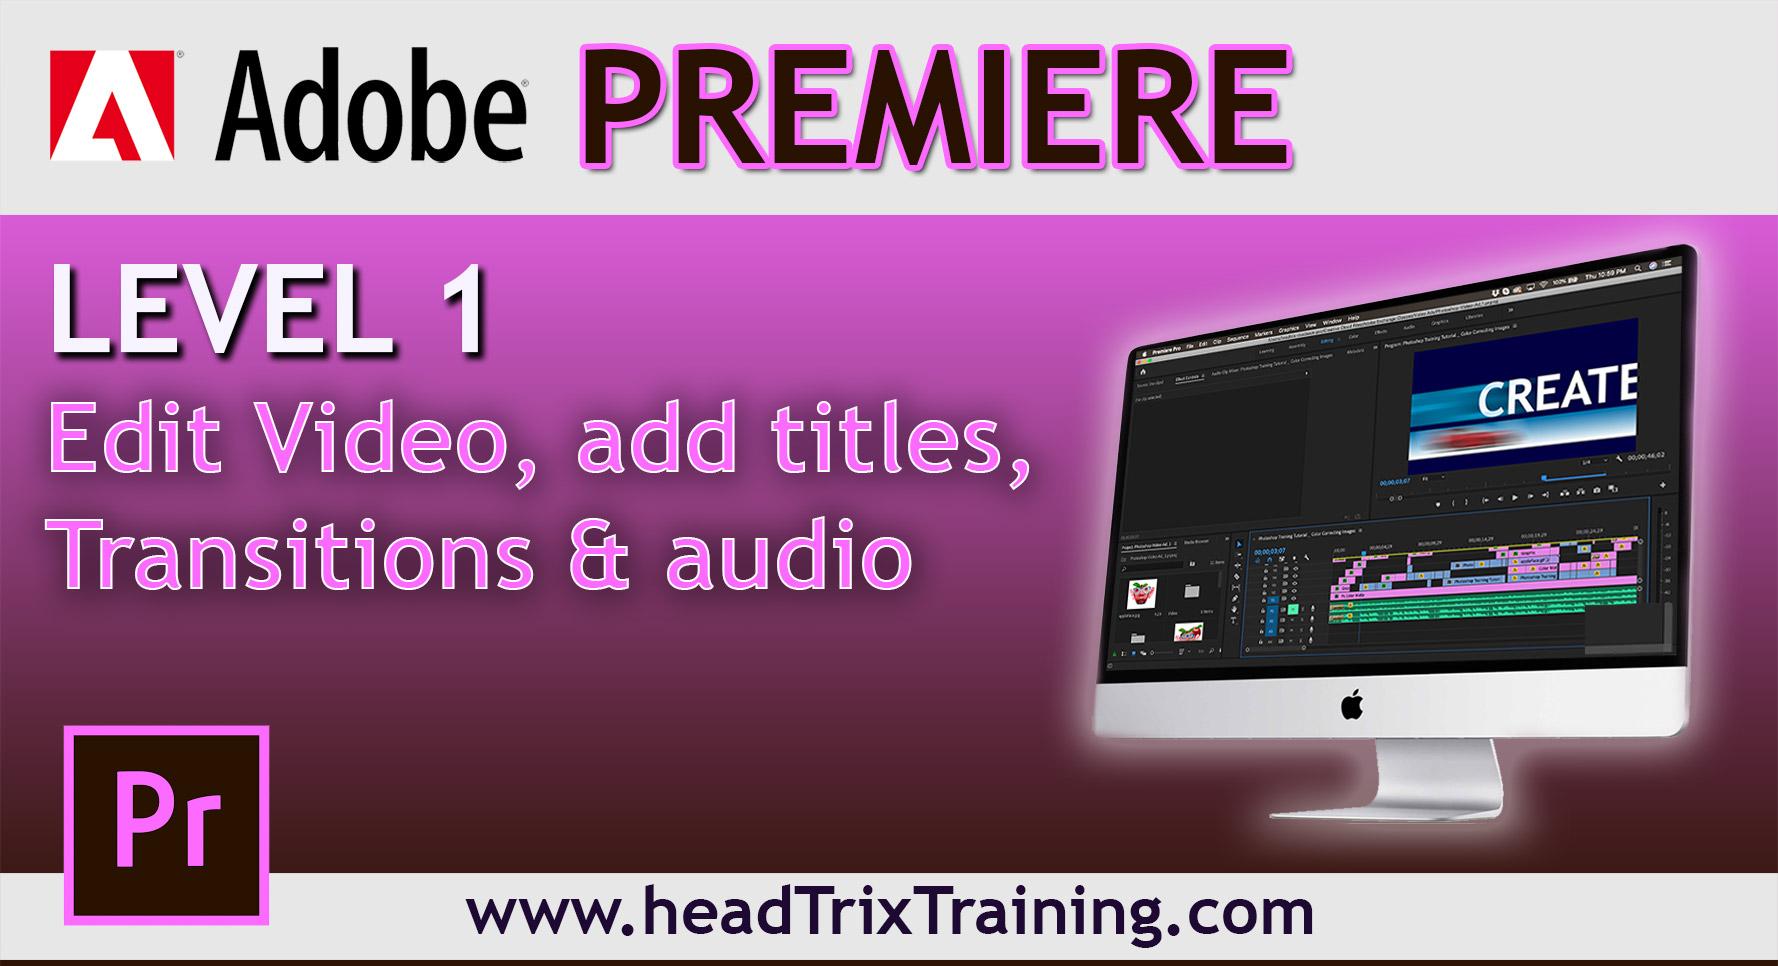 headTrix, Inc | Adobe Certified Training & Consulting